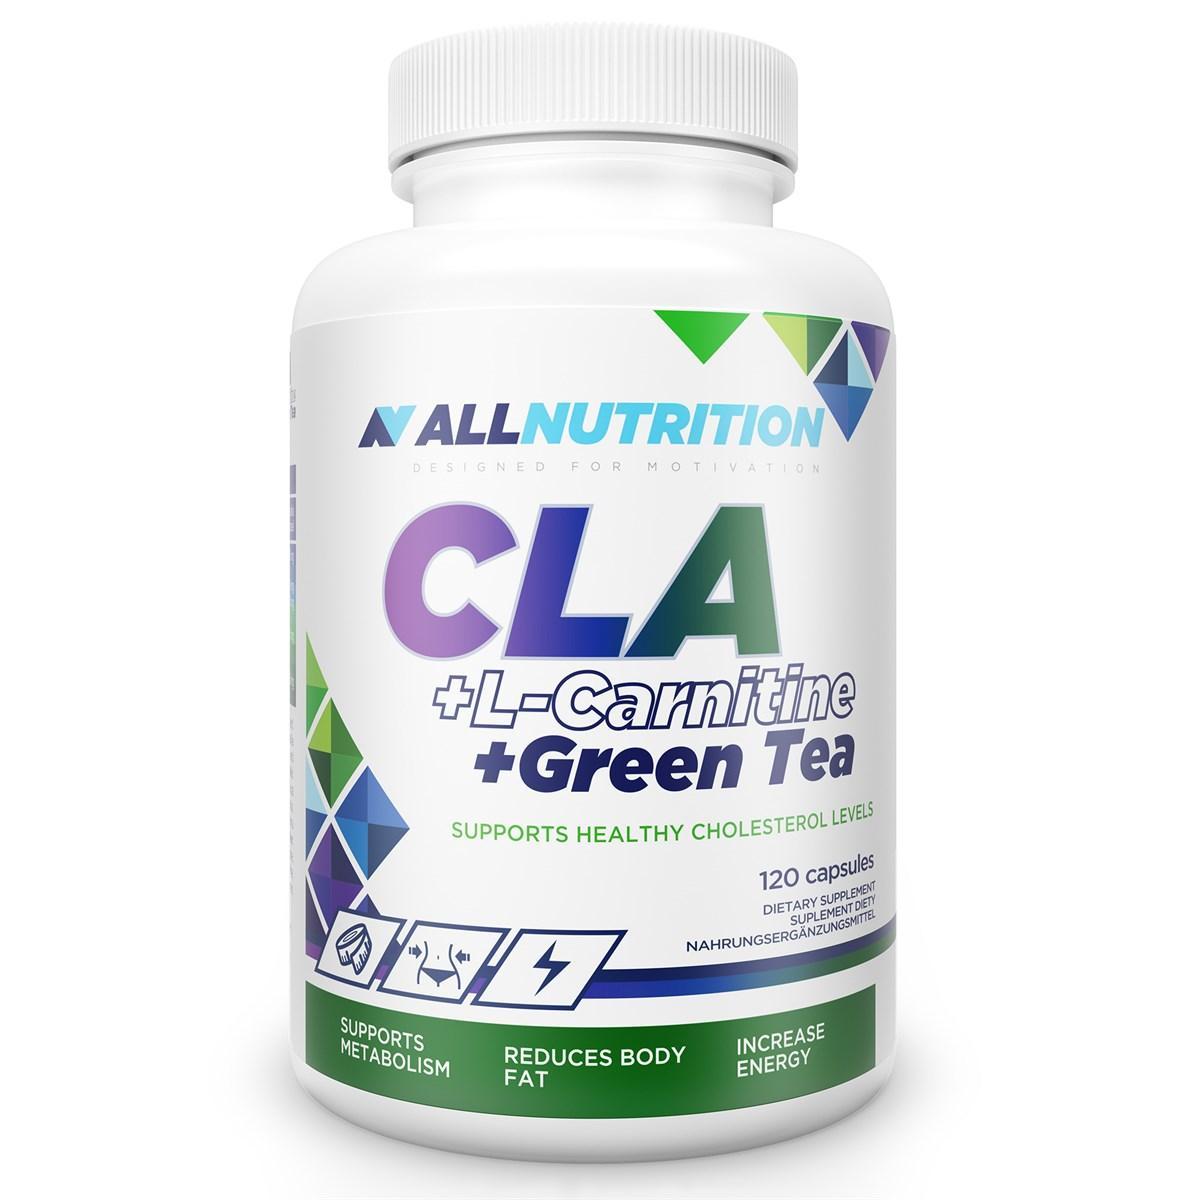 Л-карнитин AllNutrition CLA + L-Carnitine + Green Tea - 120cap алл нутришн